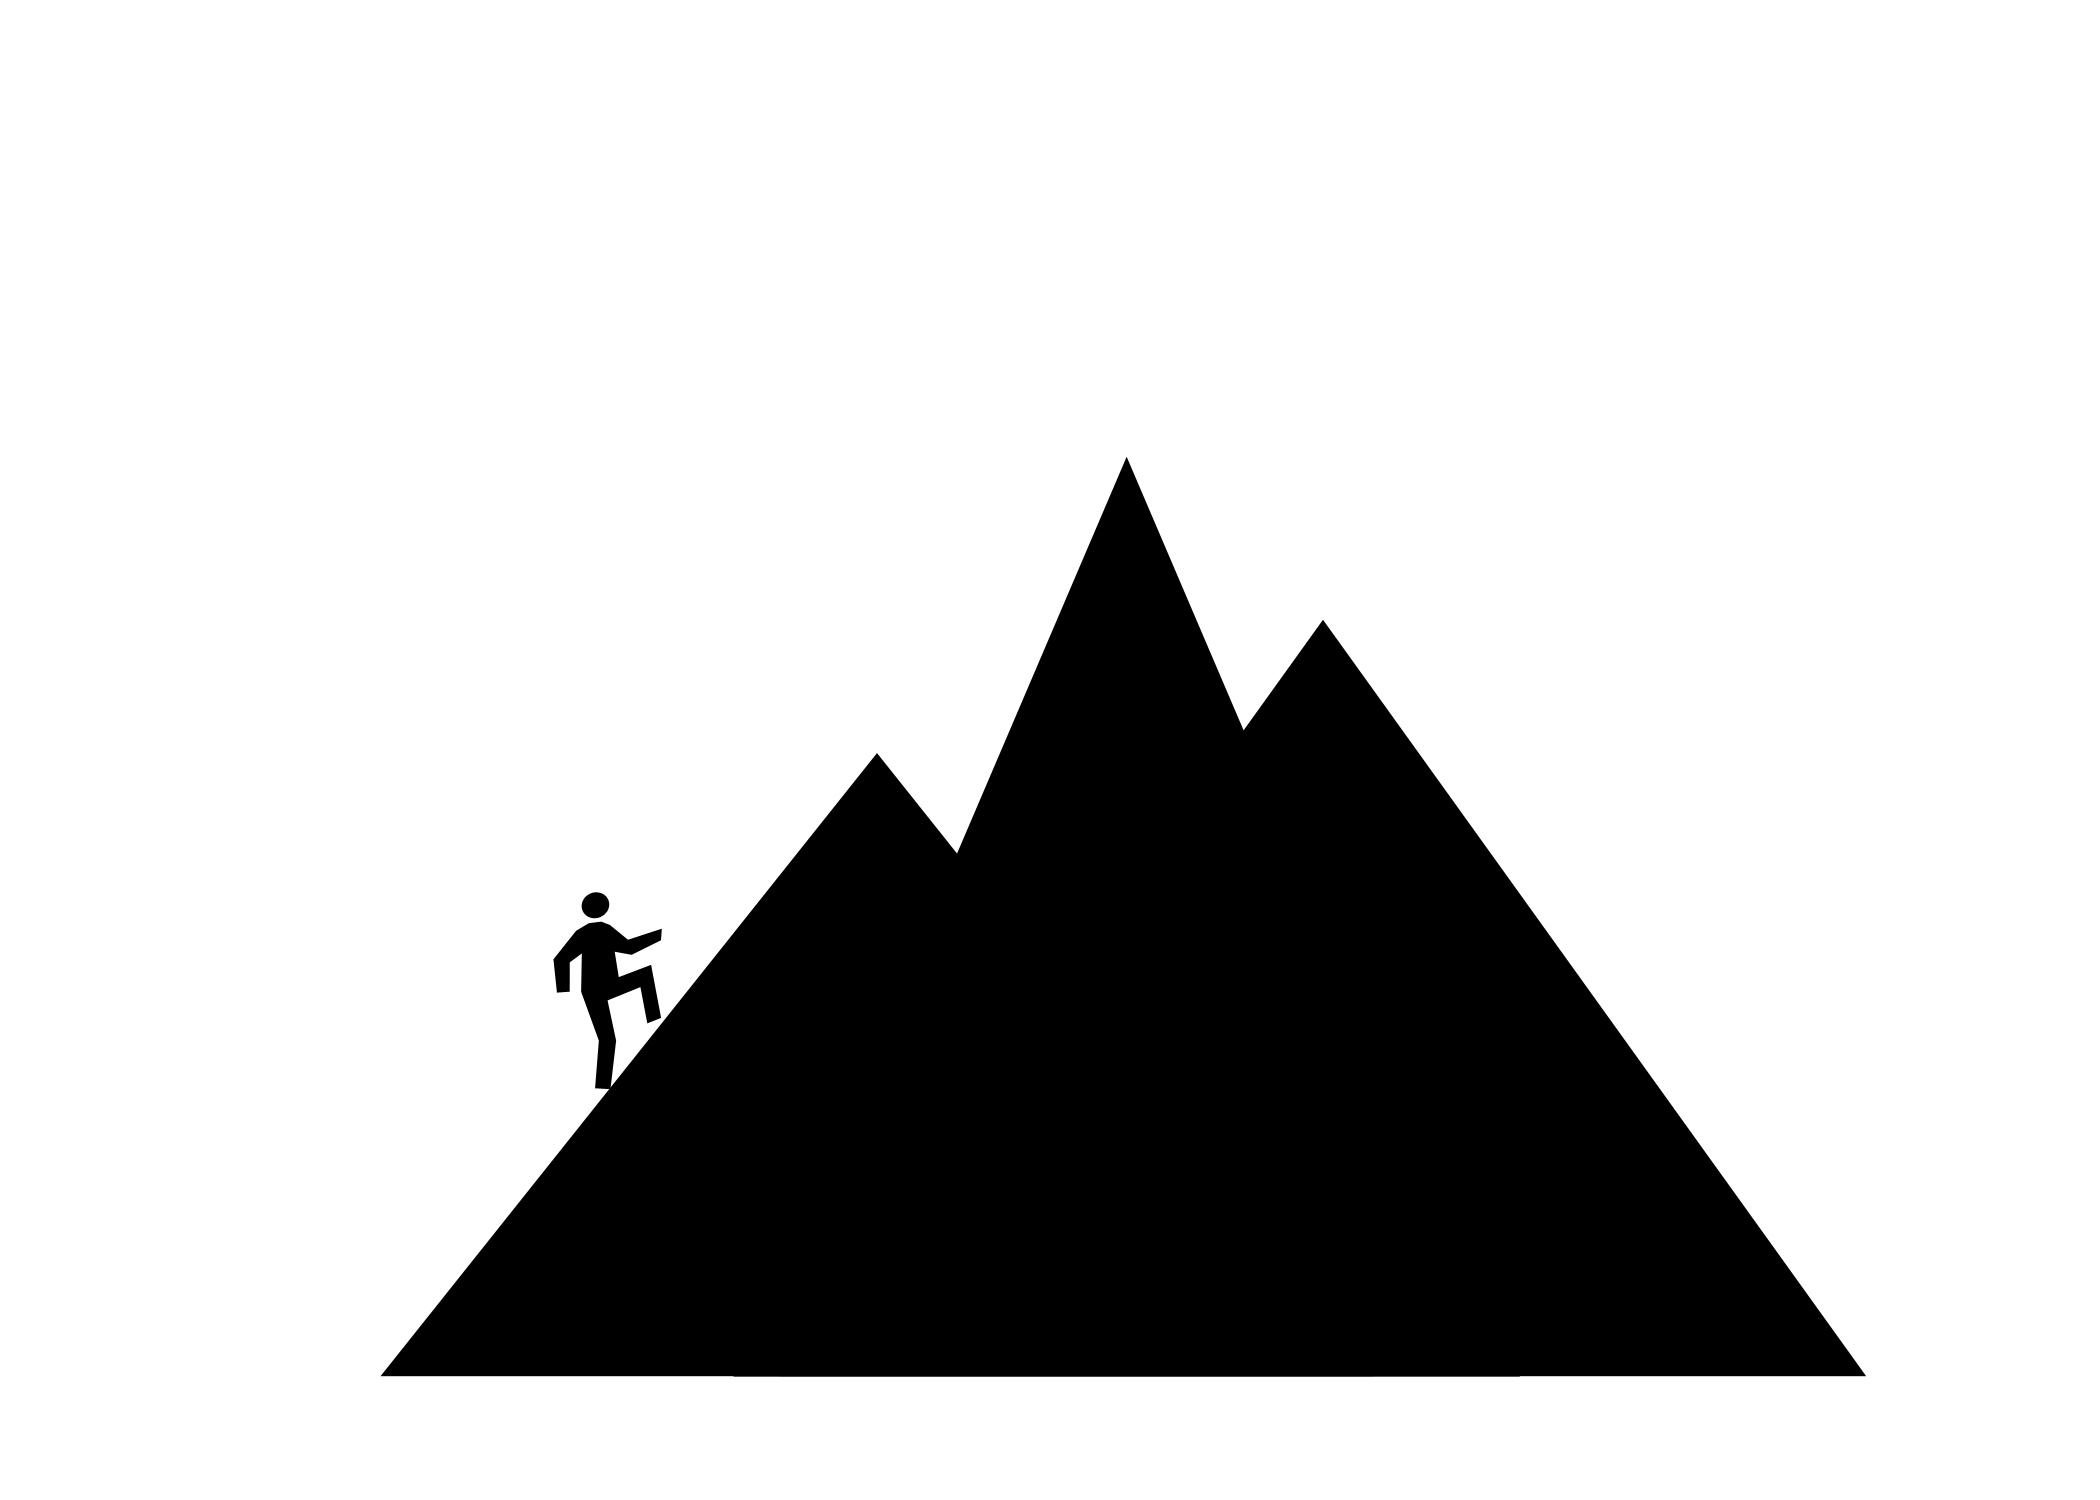 2100x1500 Mountain Man Silhouette Clipart